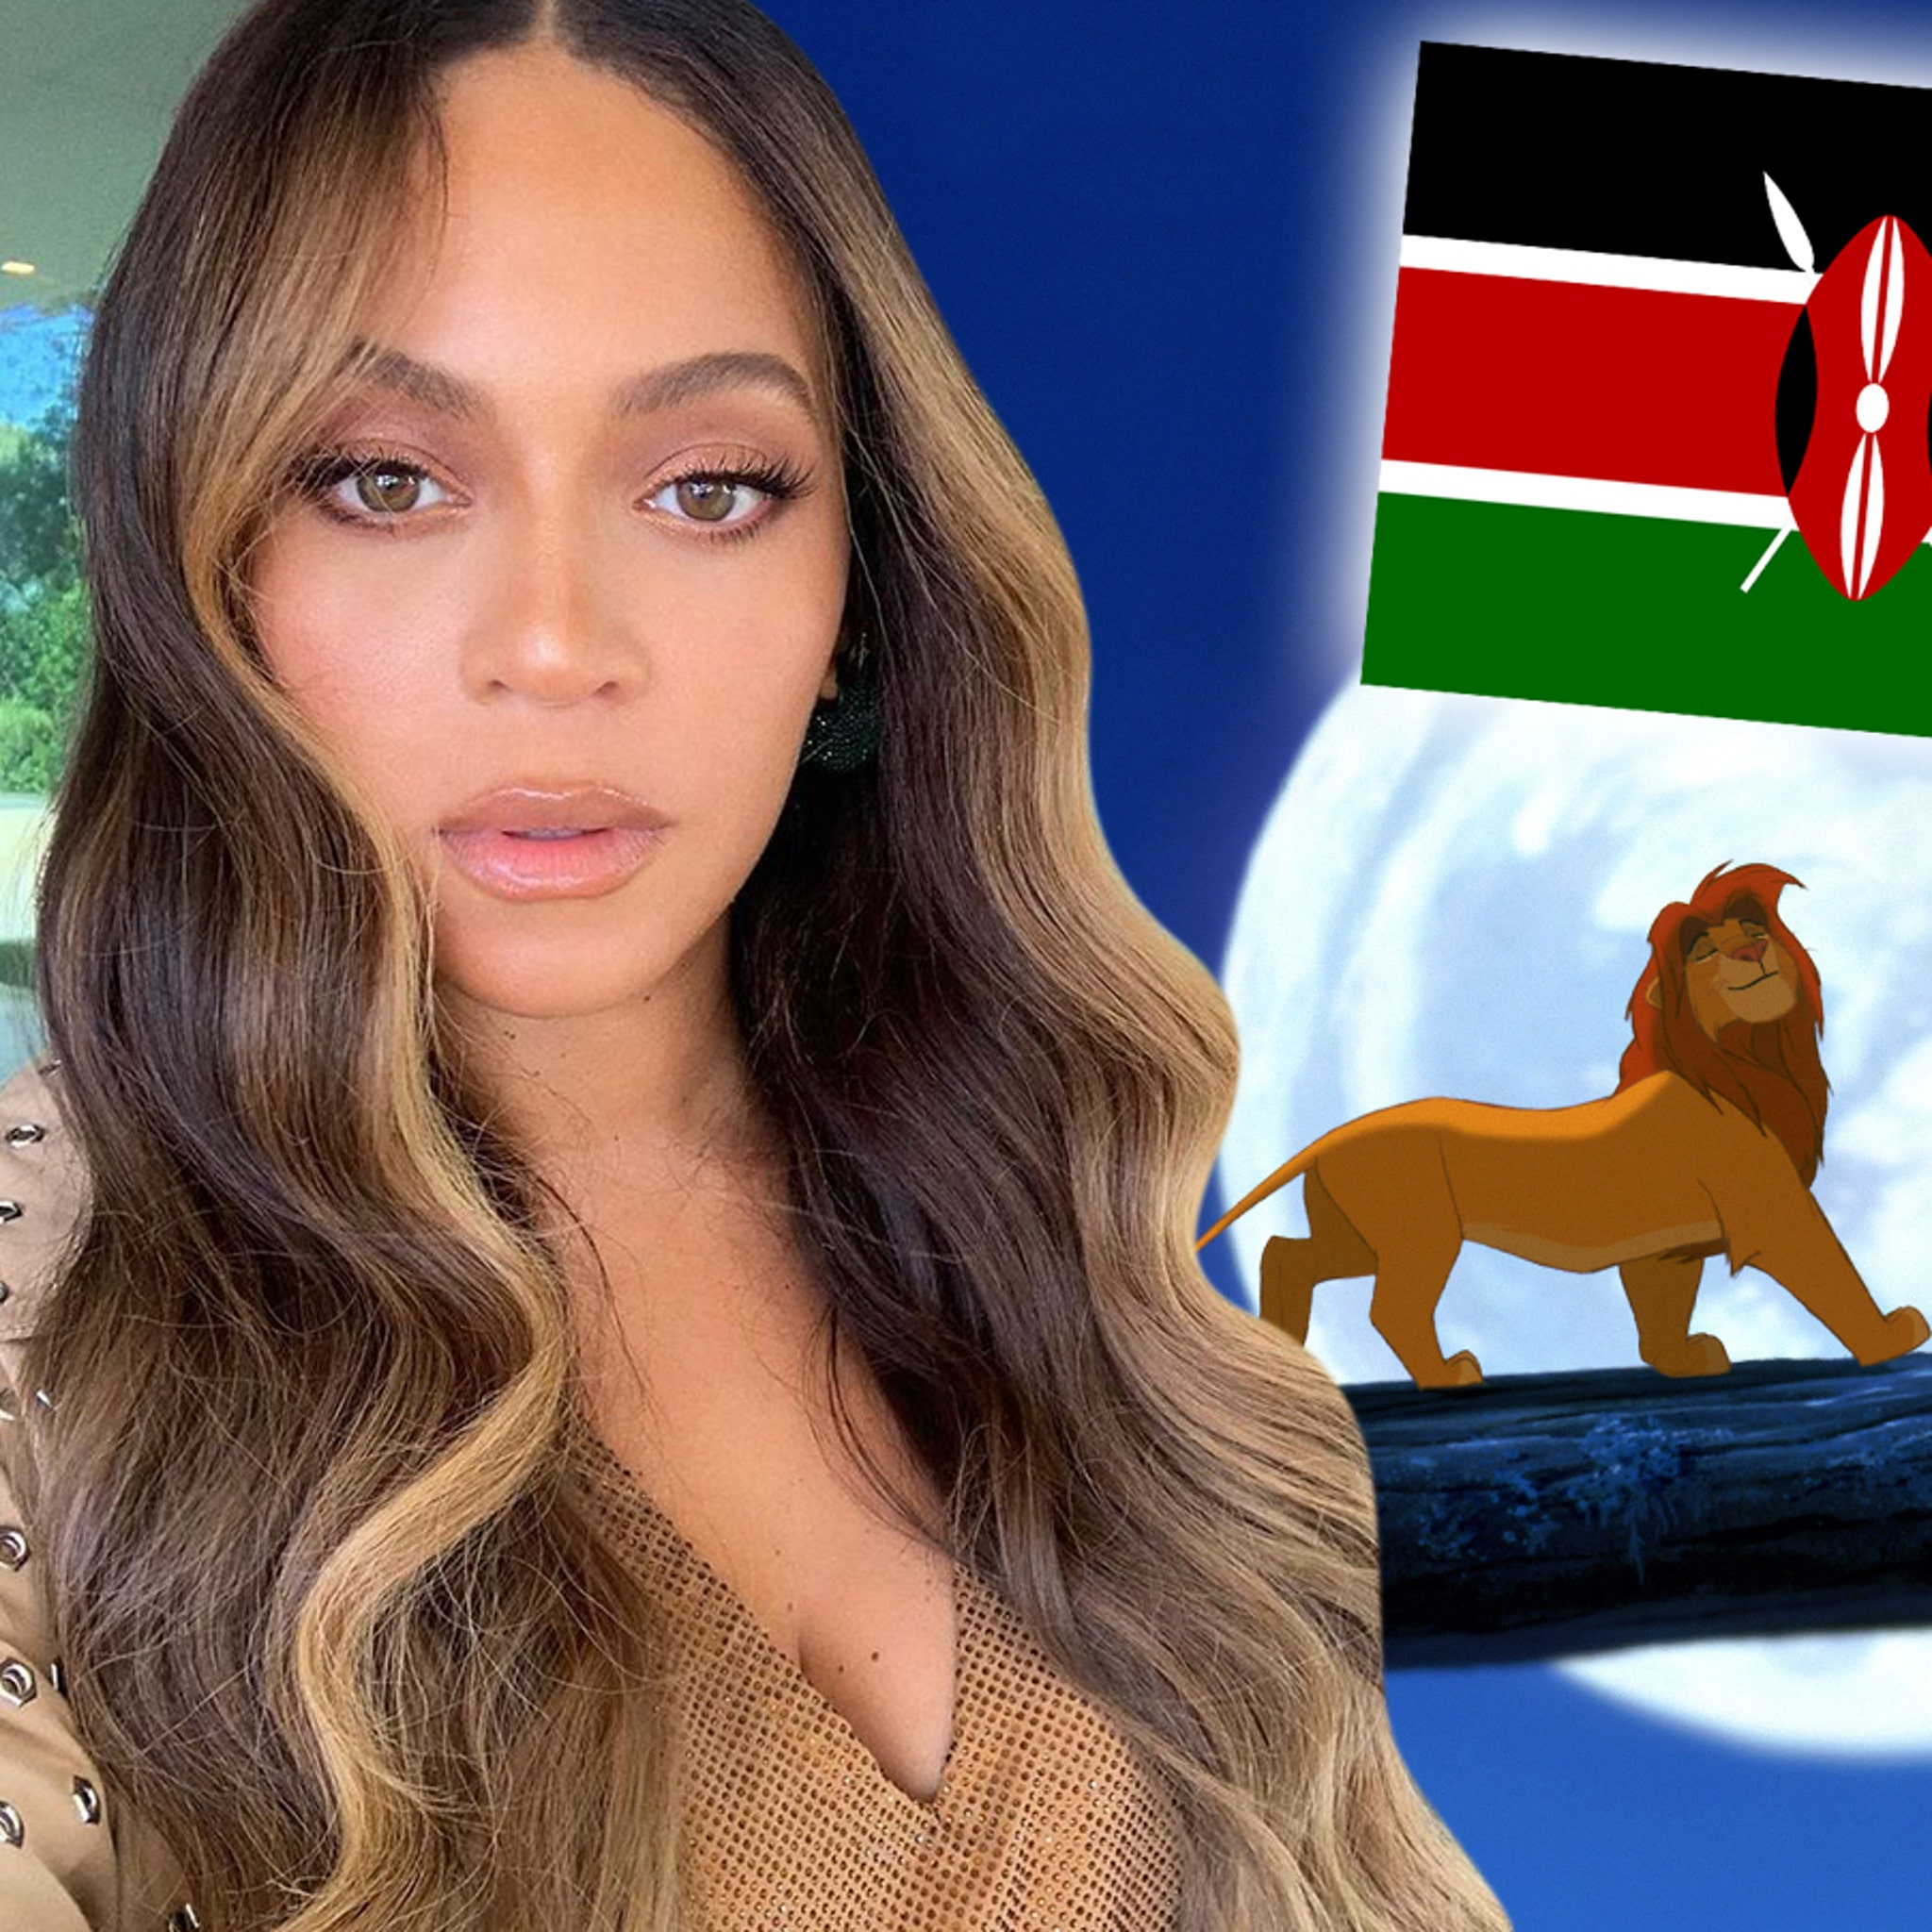 Beyonce Snubbed Kenya on 'Lion King' Album, Says Them Mushrooms Singer